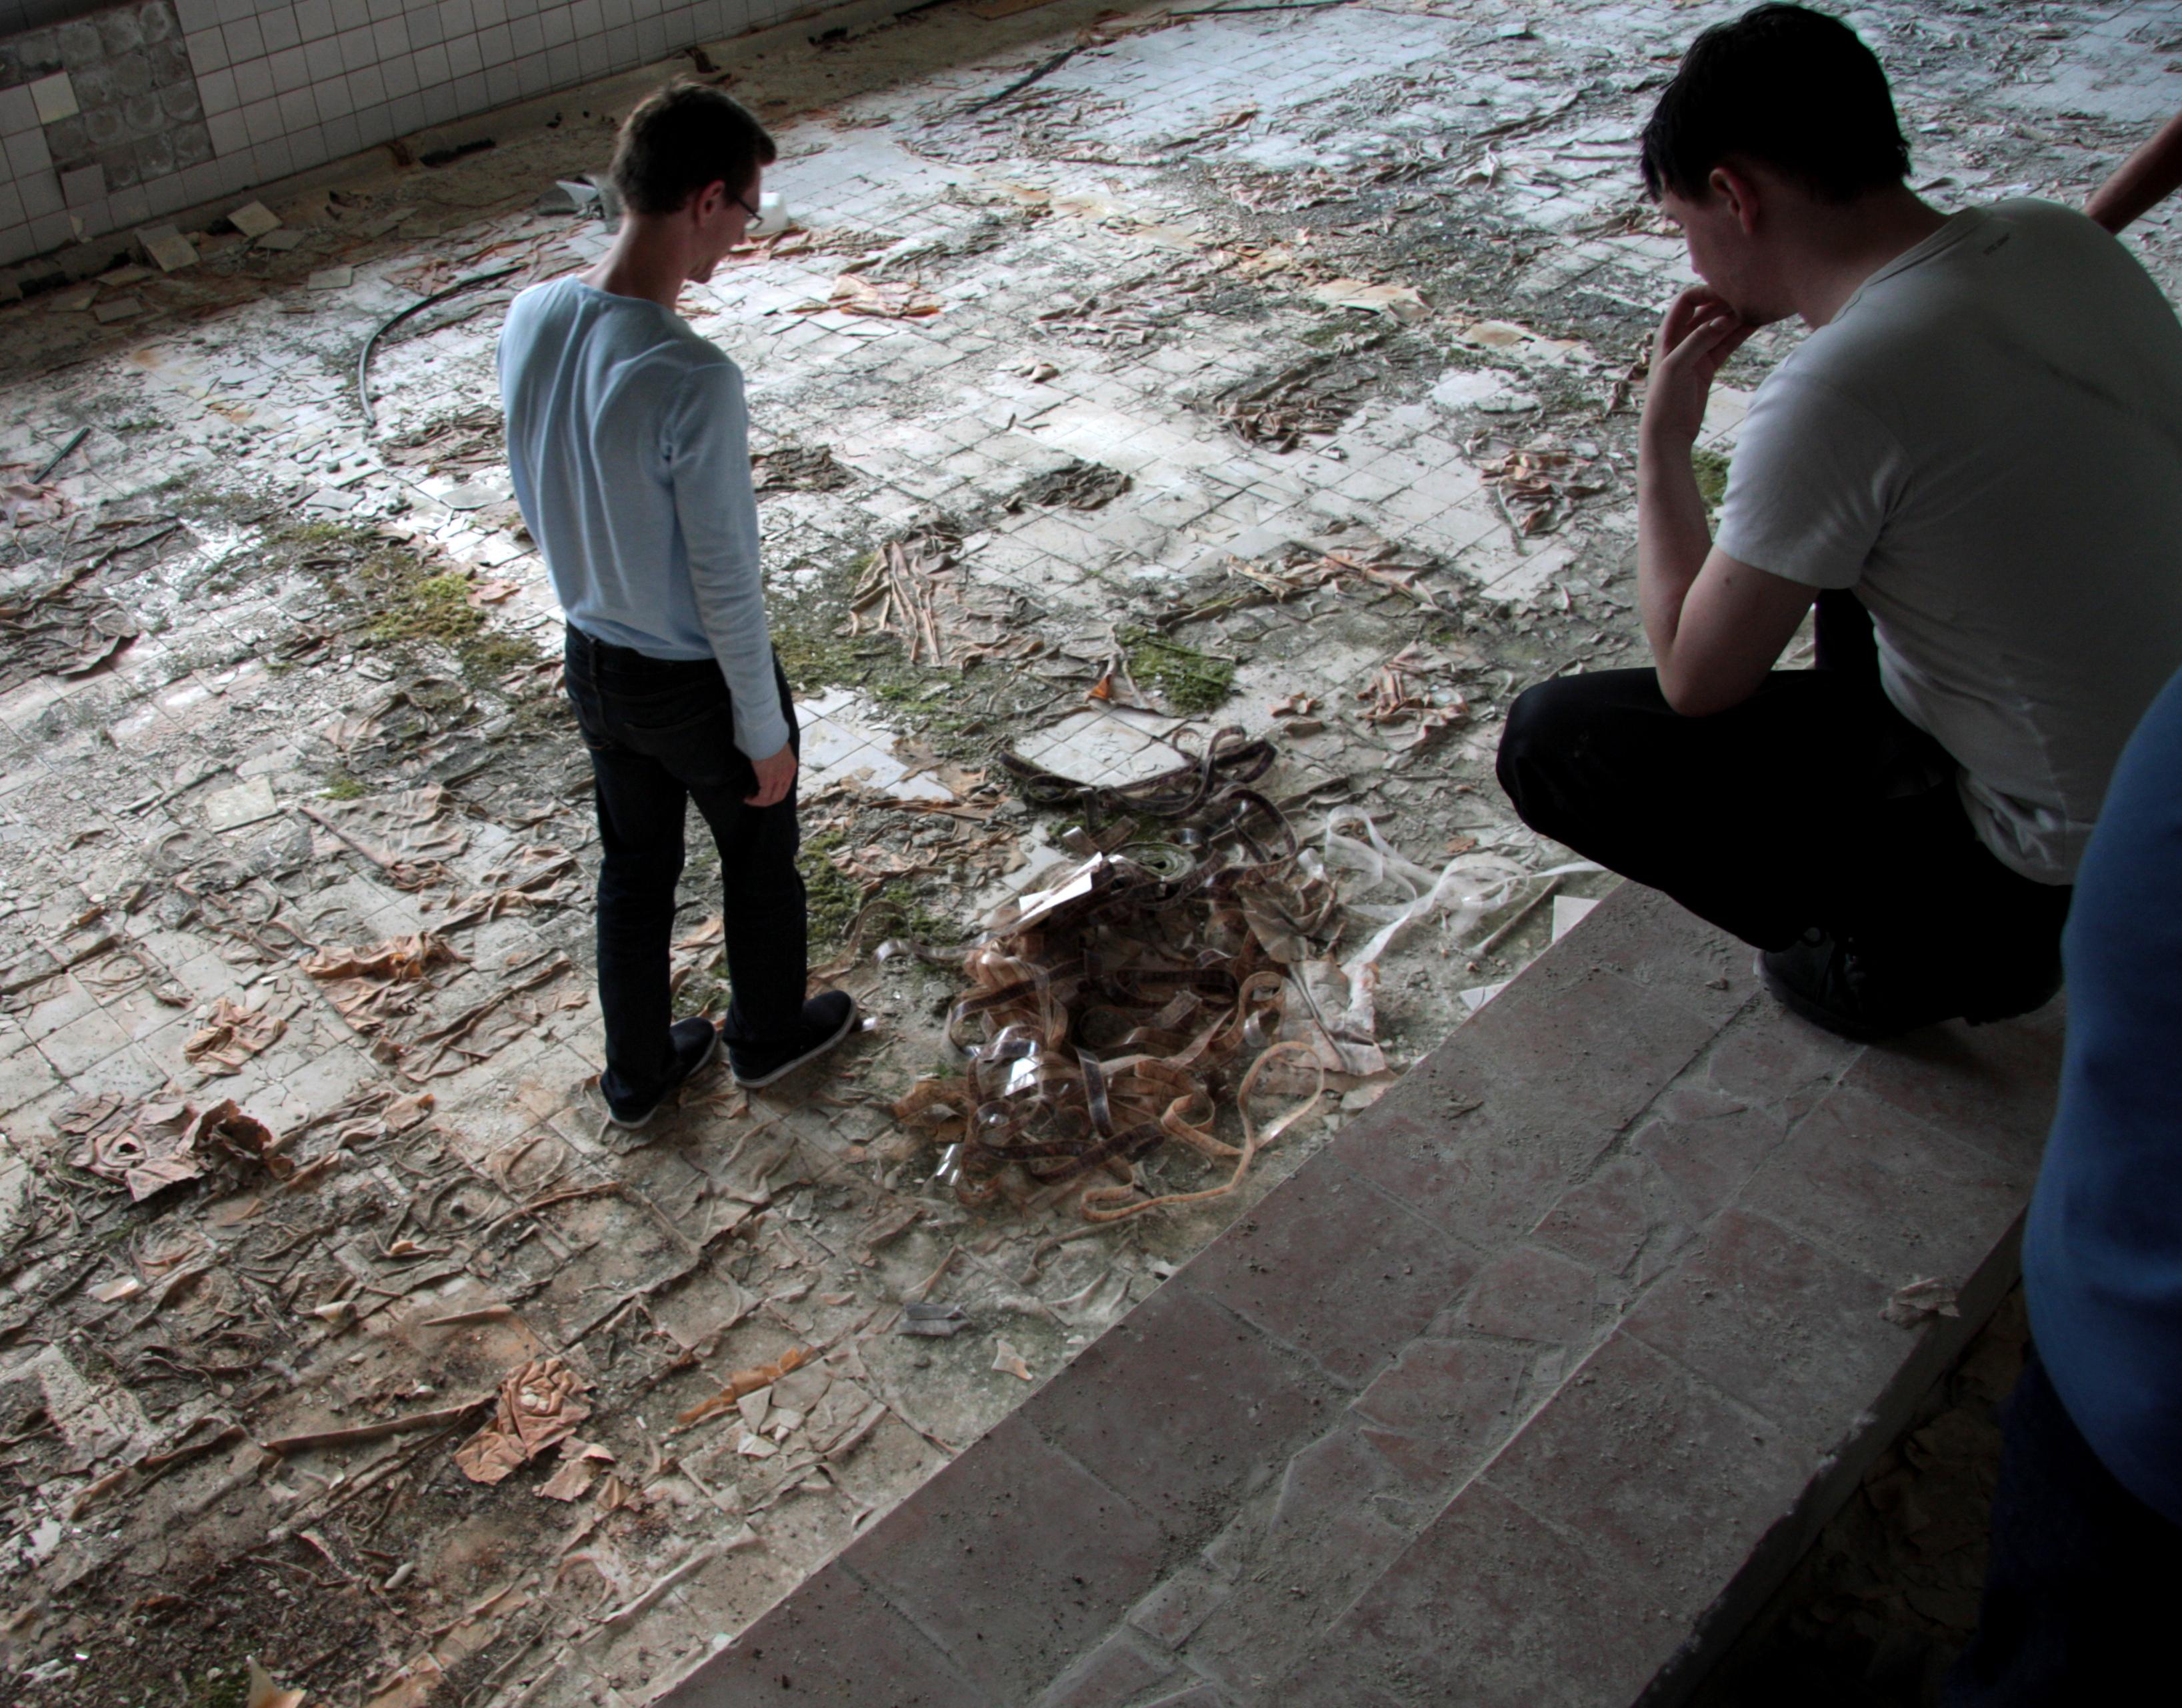 Chernobyl And Stalker Splinters Of The Soviet Empire Toxic News